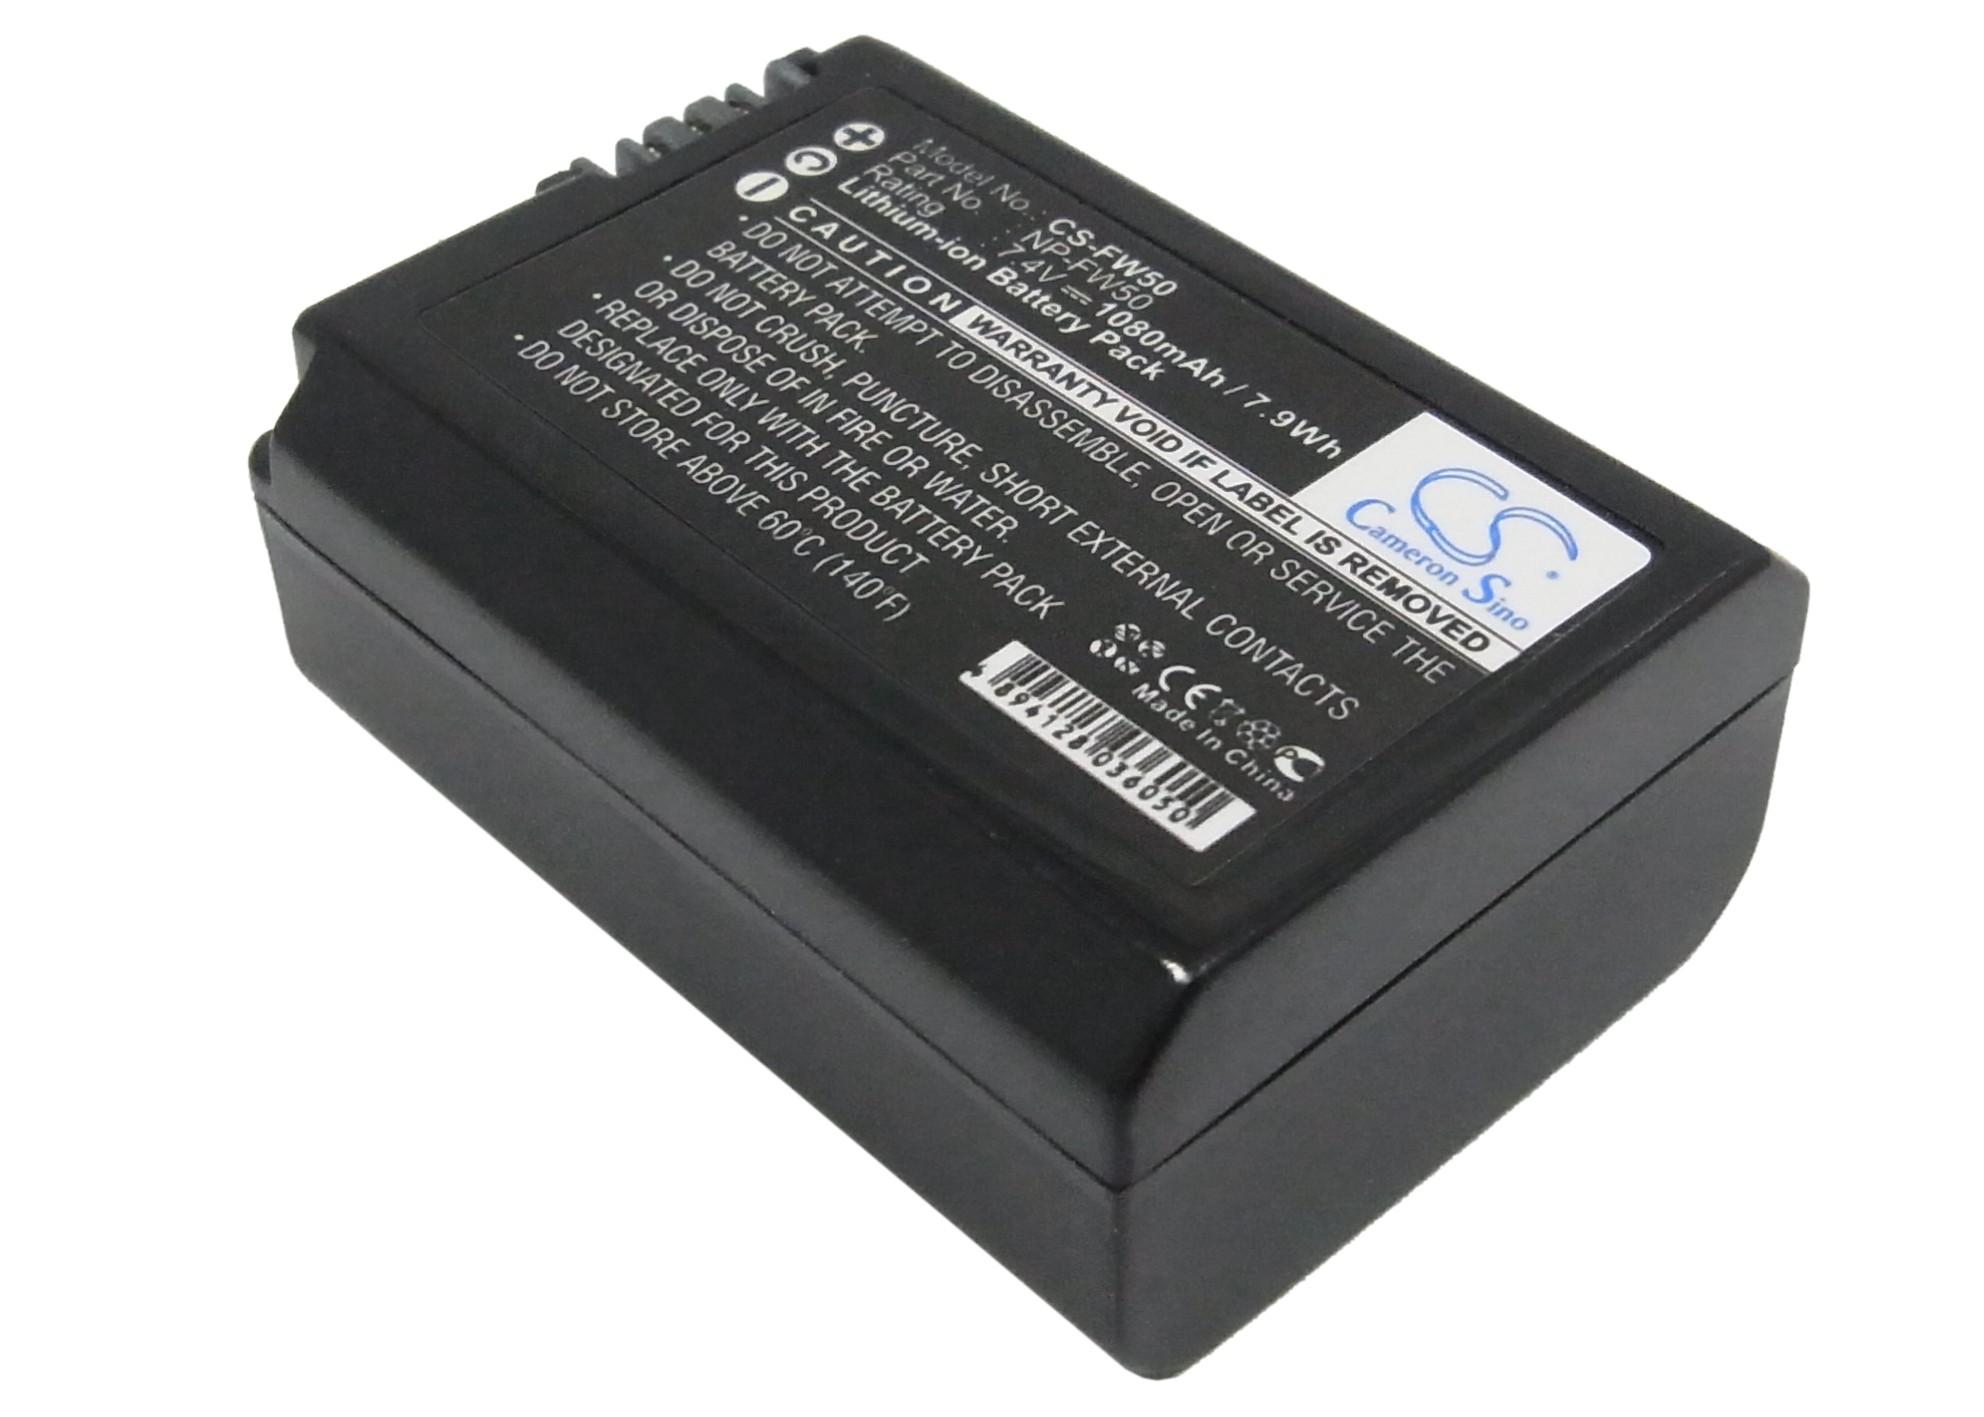 Cameron Sino baterie do kamer a fotoaparátů pro SONY NEX-3 7.4V Li-ion 1080mAh černá - neoriginální